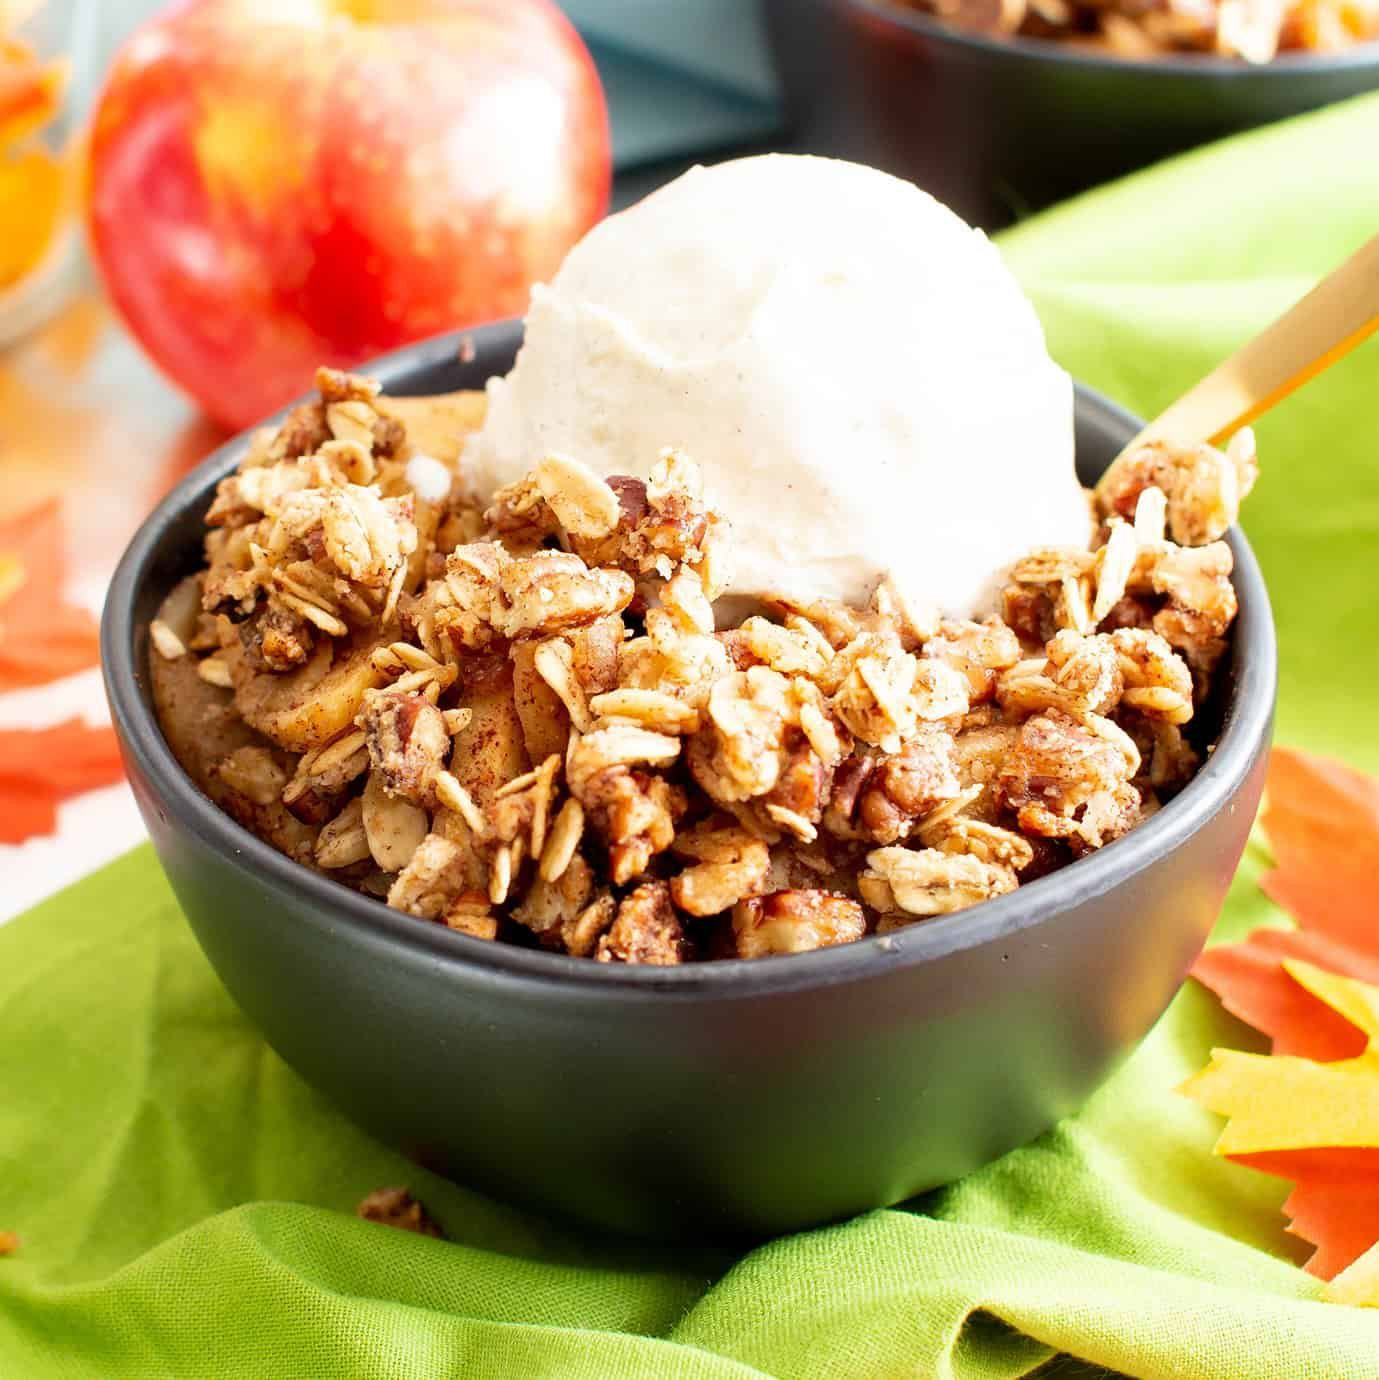 Vegan Gluten Free Cinnamon Apple Crisp With Oats (Dairy